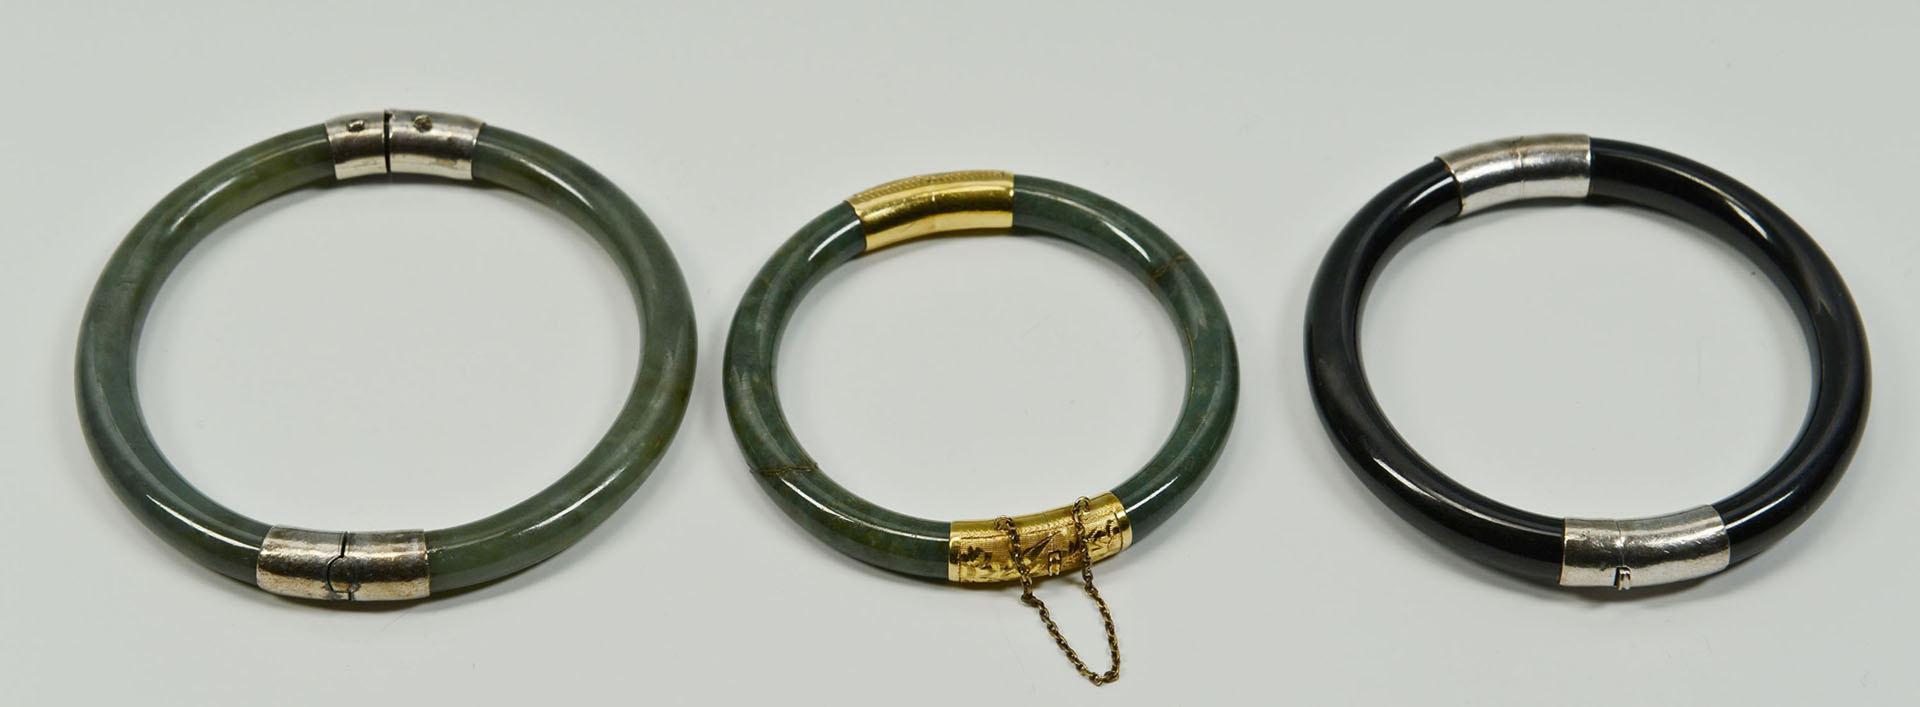 Lot 722: 3 Asian Bangle Bracelets, 2 Jade